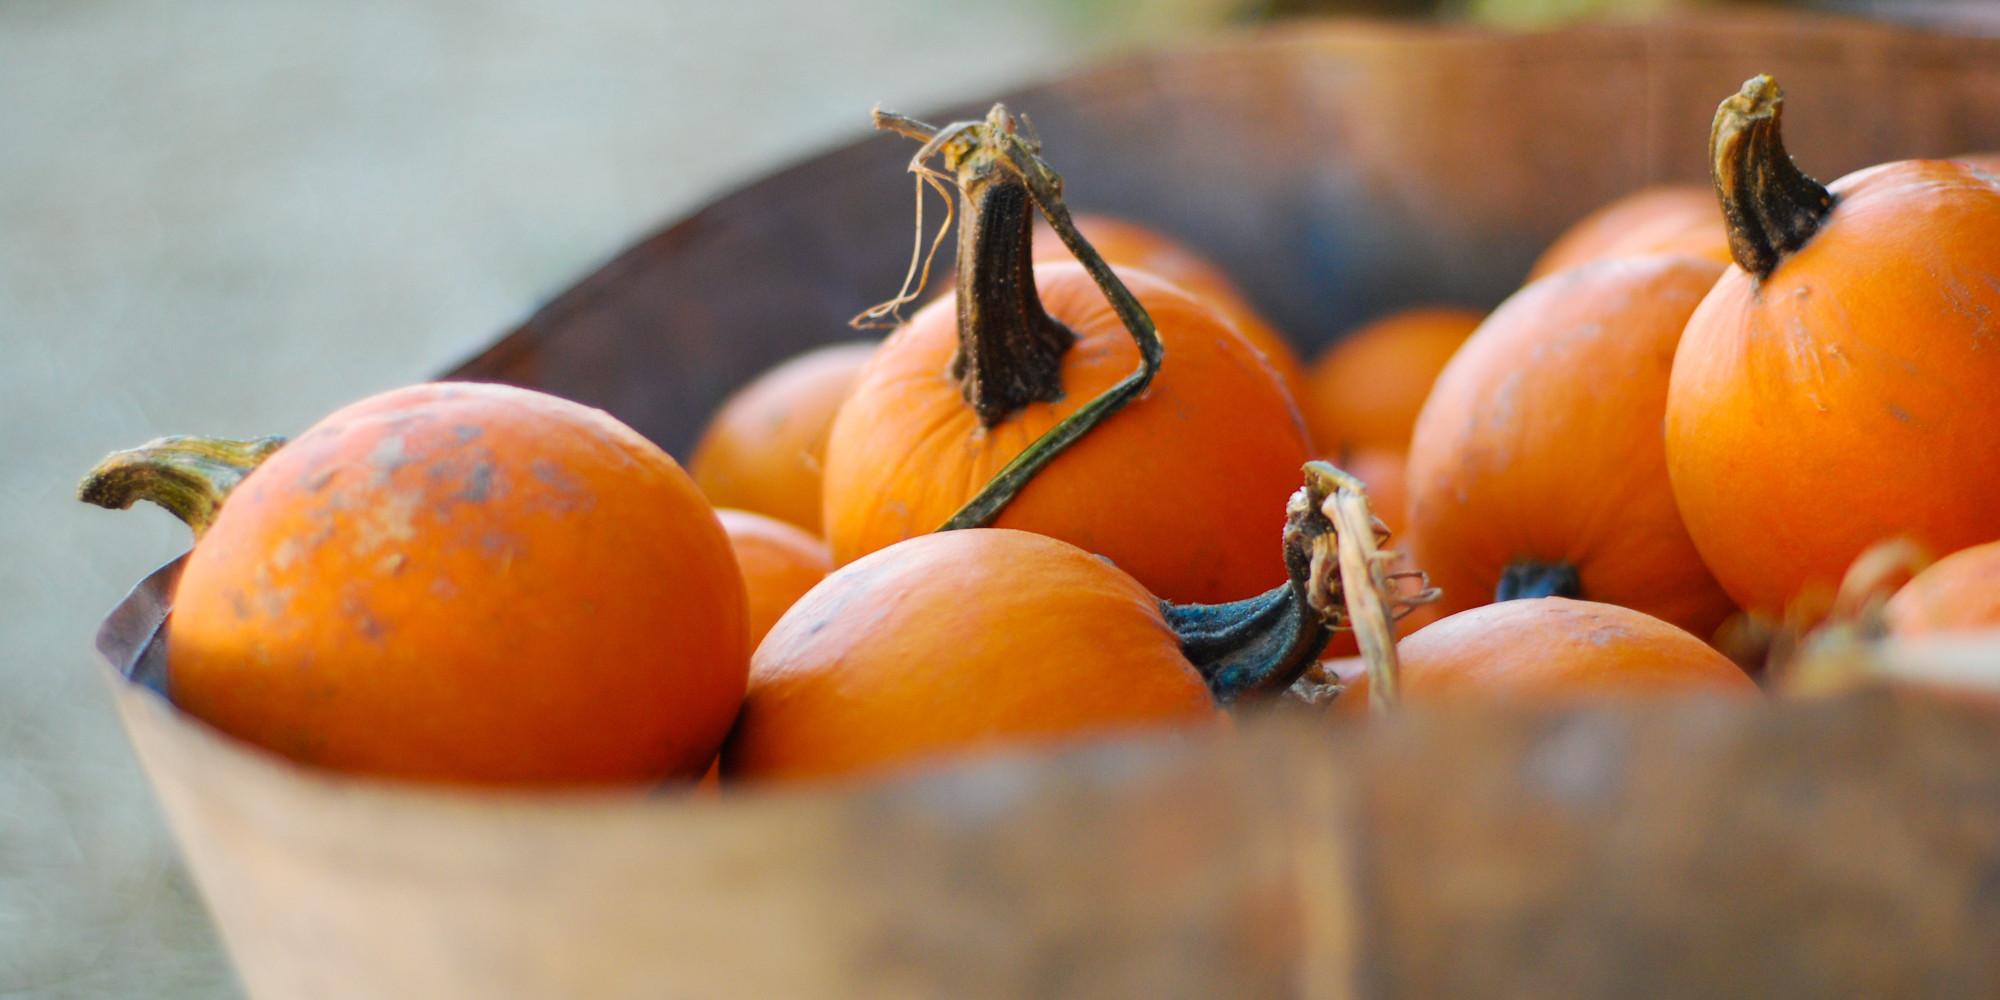 8 Impressive Health Benefits Of Pumpkin | HuffPost